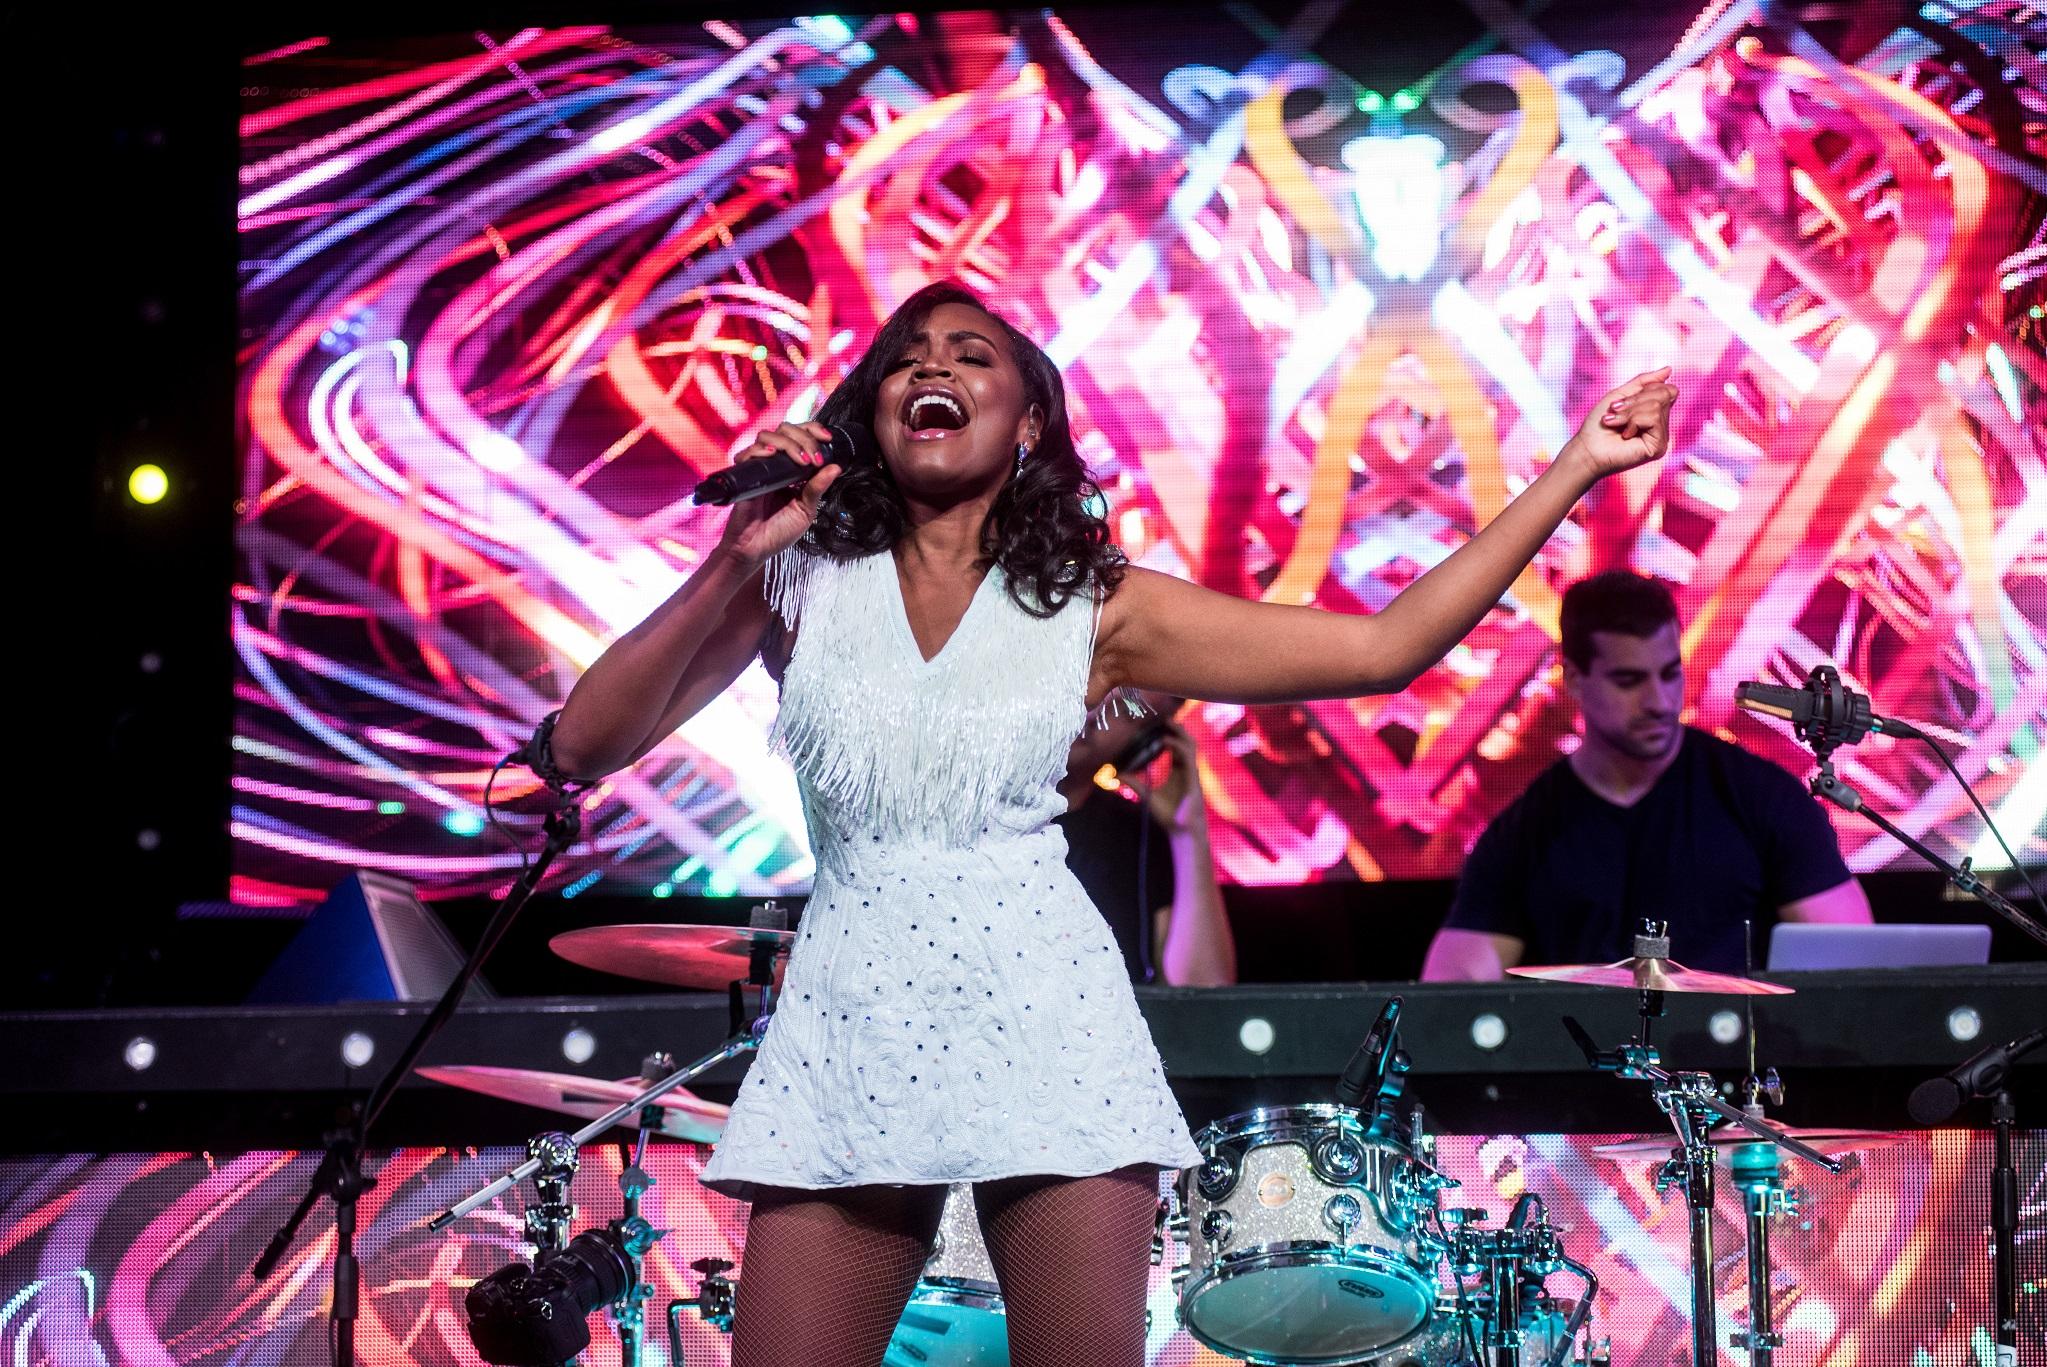 Glorious-Pop Singer-Livetronica Drummer-Producer-Songwriter-Marquee-Nightclub-Video-New York-NY-12lr.jpg